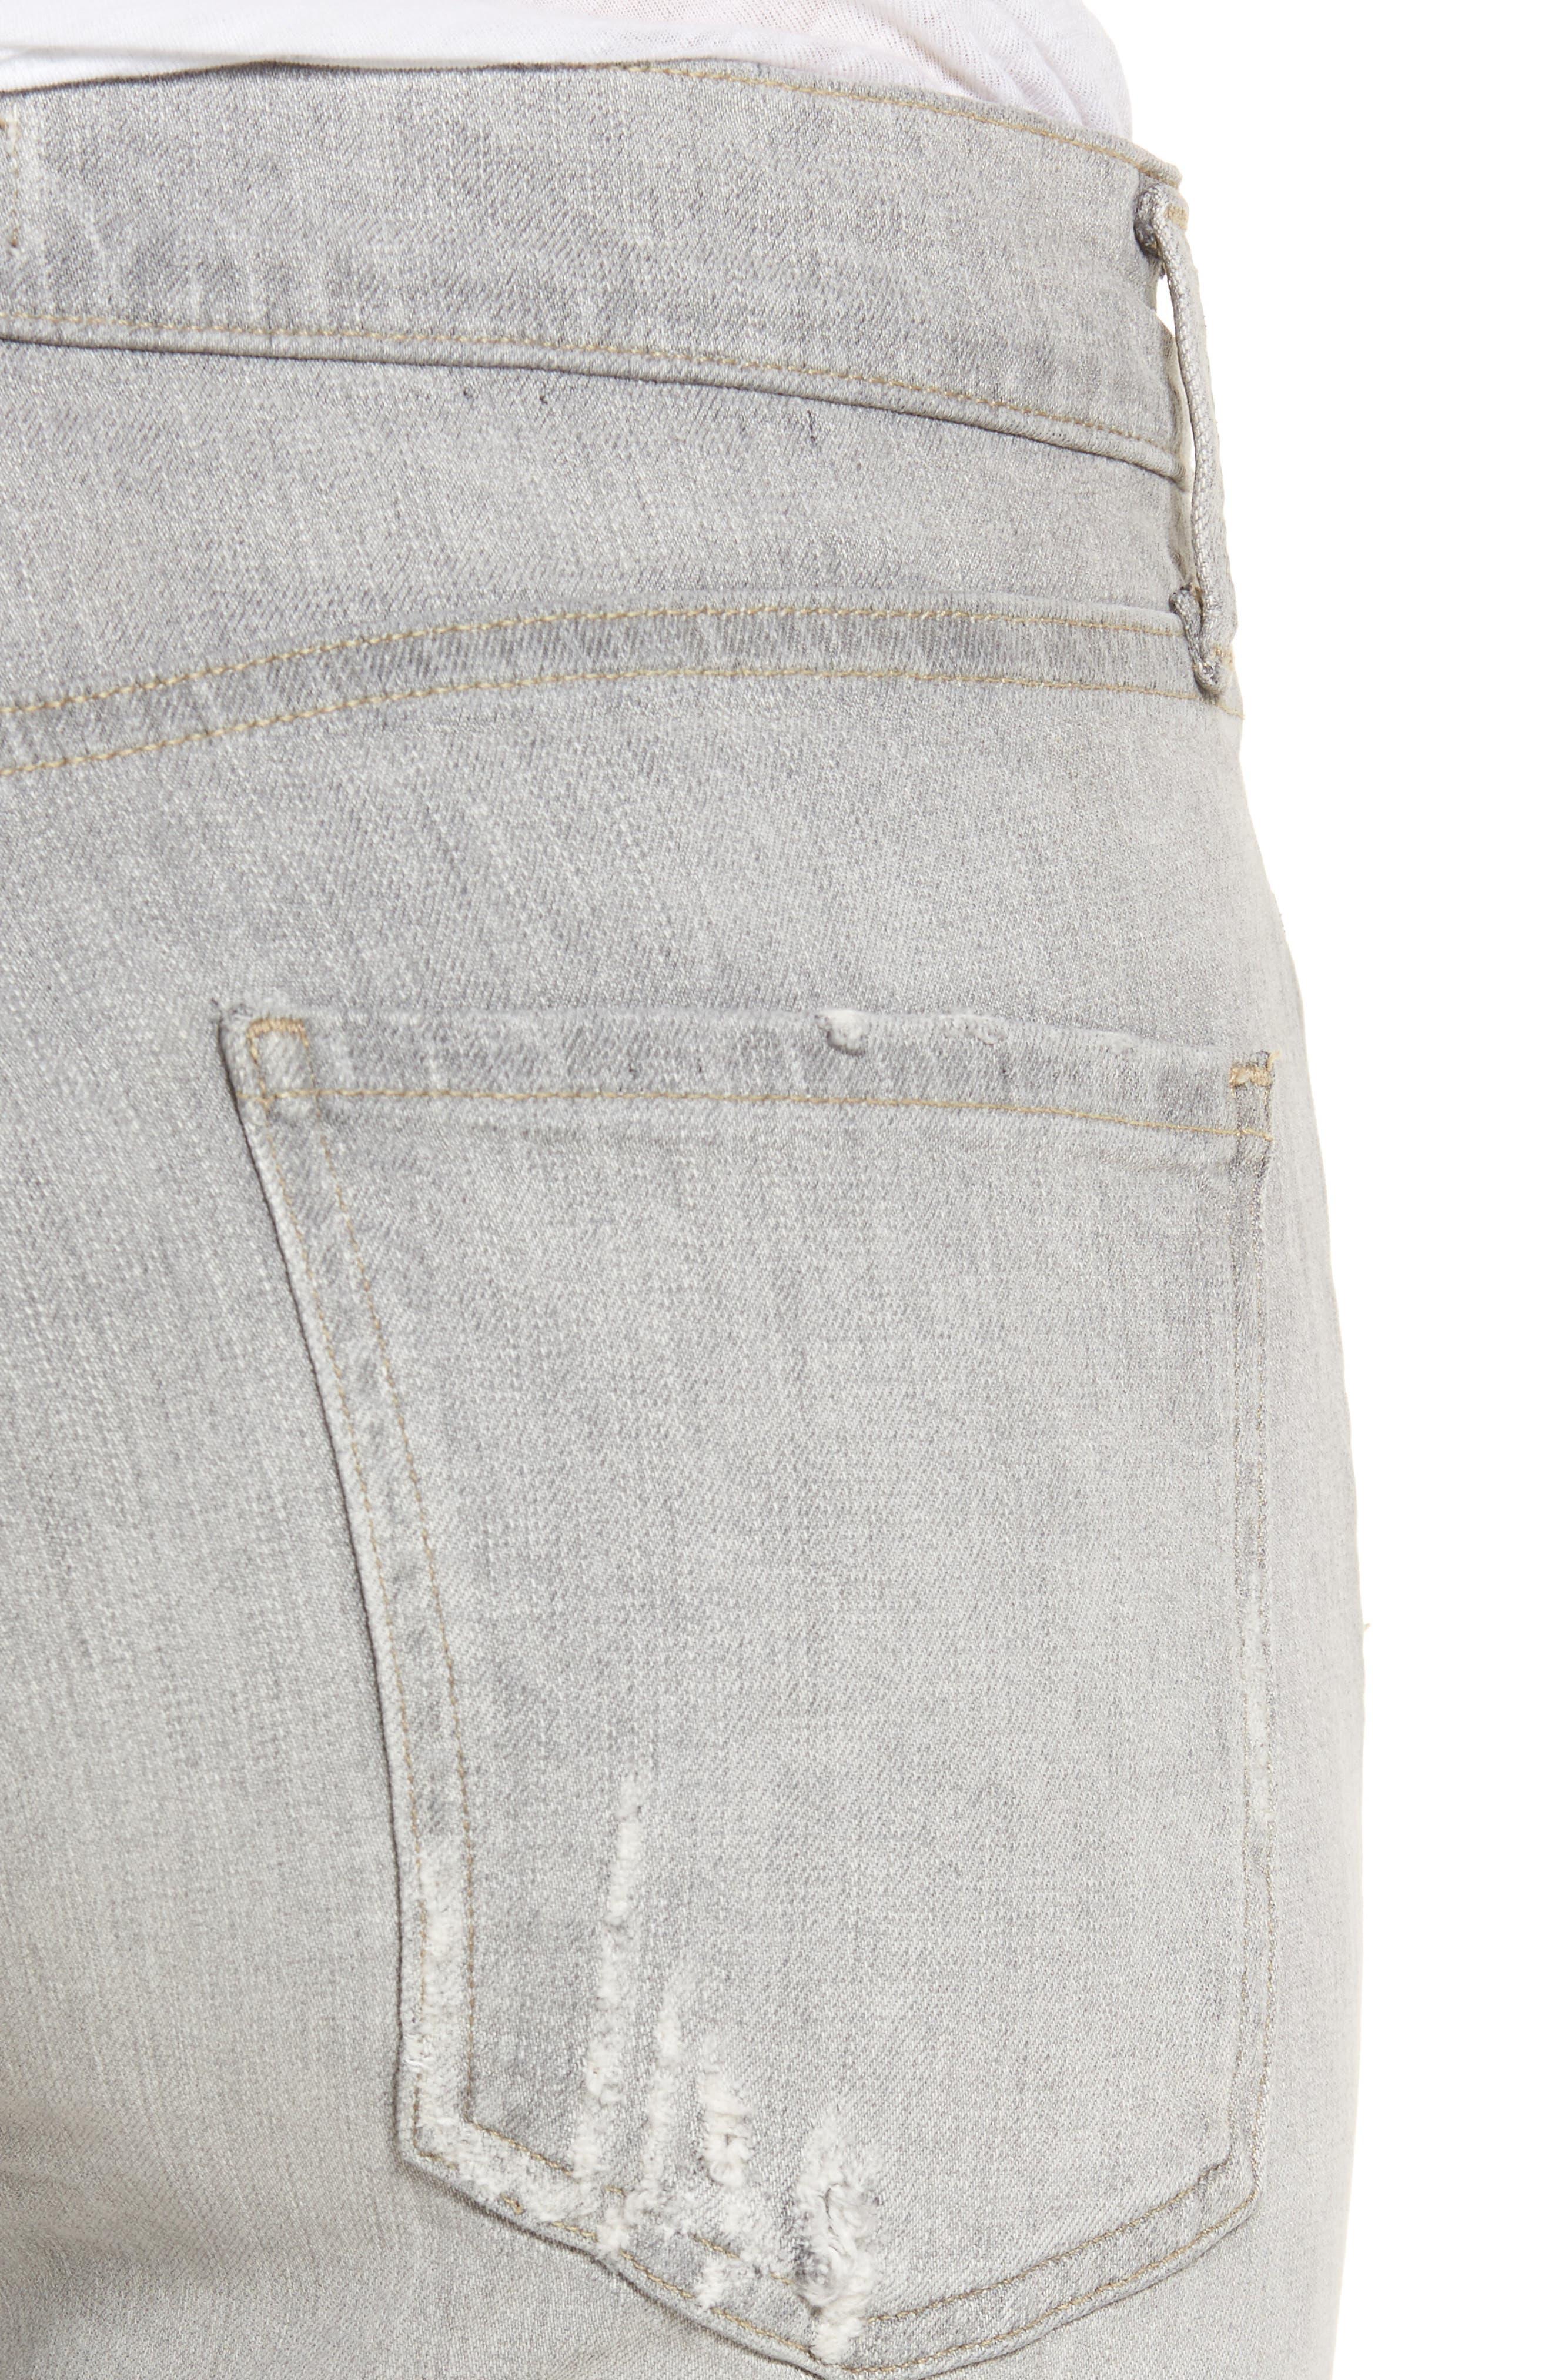 Sophie High Waist Skinny Jeans,                             Alternate thumbnail 4, color,                             Portland Destruct